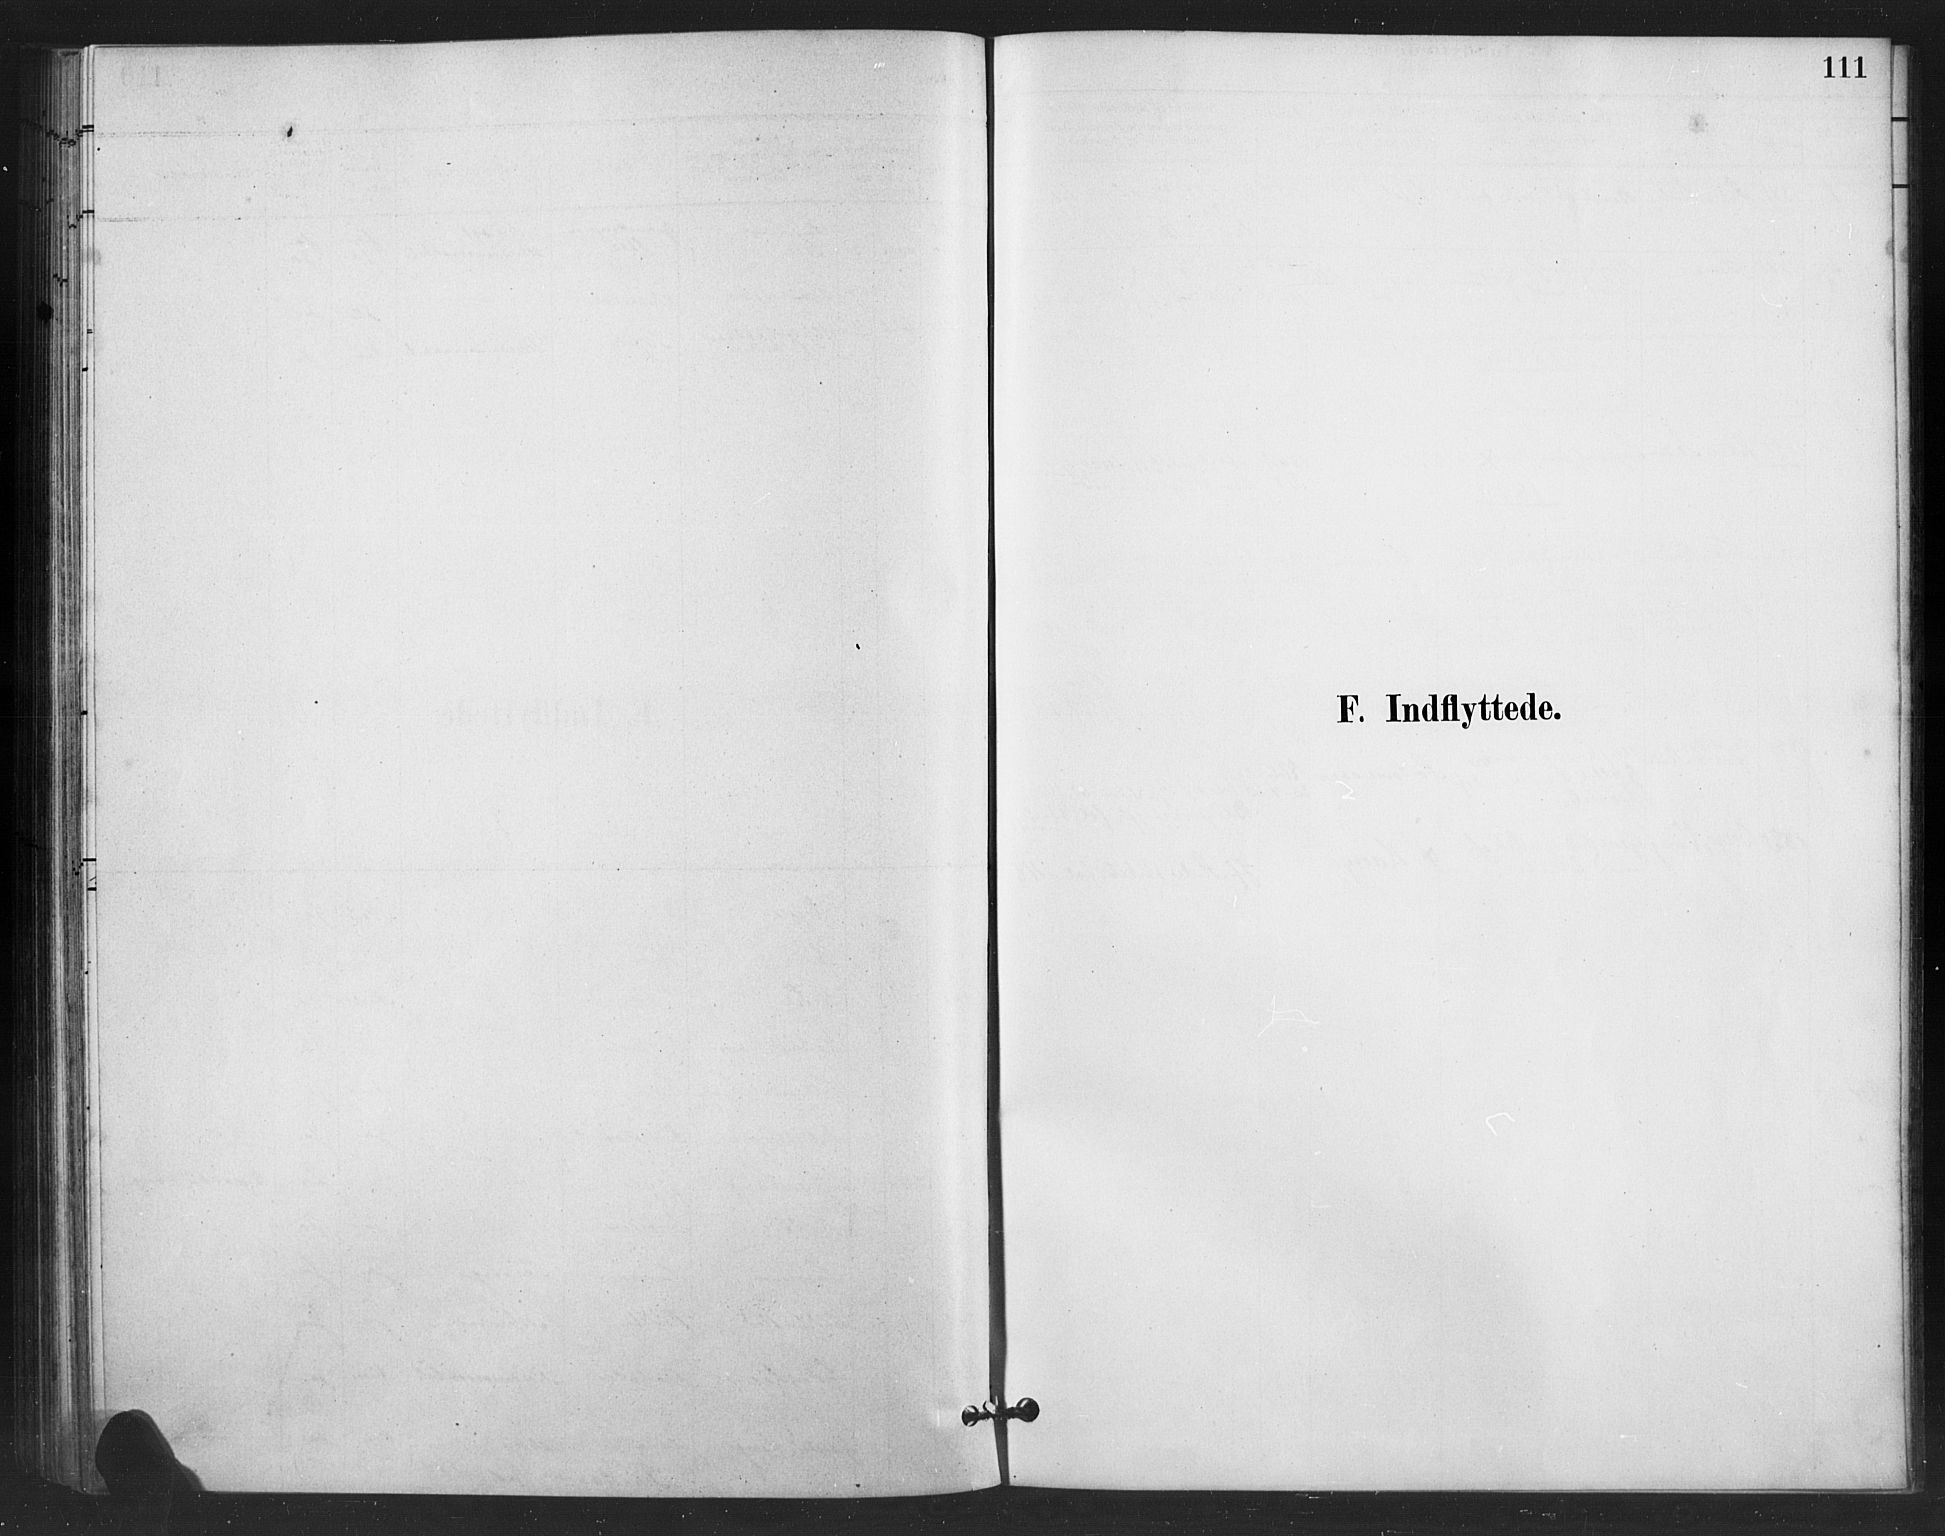 SAH, Vestre Slidre prestekontor, Klokkerbok nr. 6, 1881-1915, s. 111